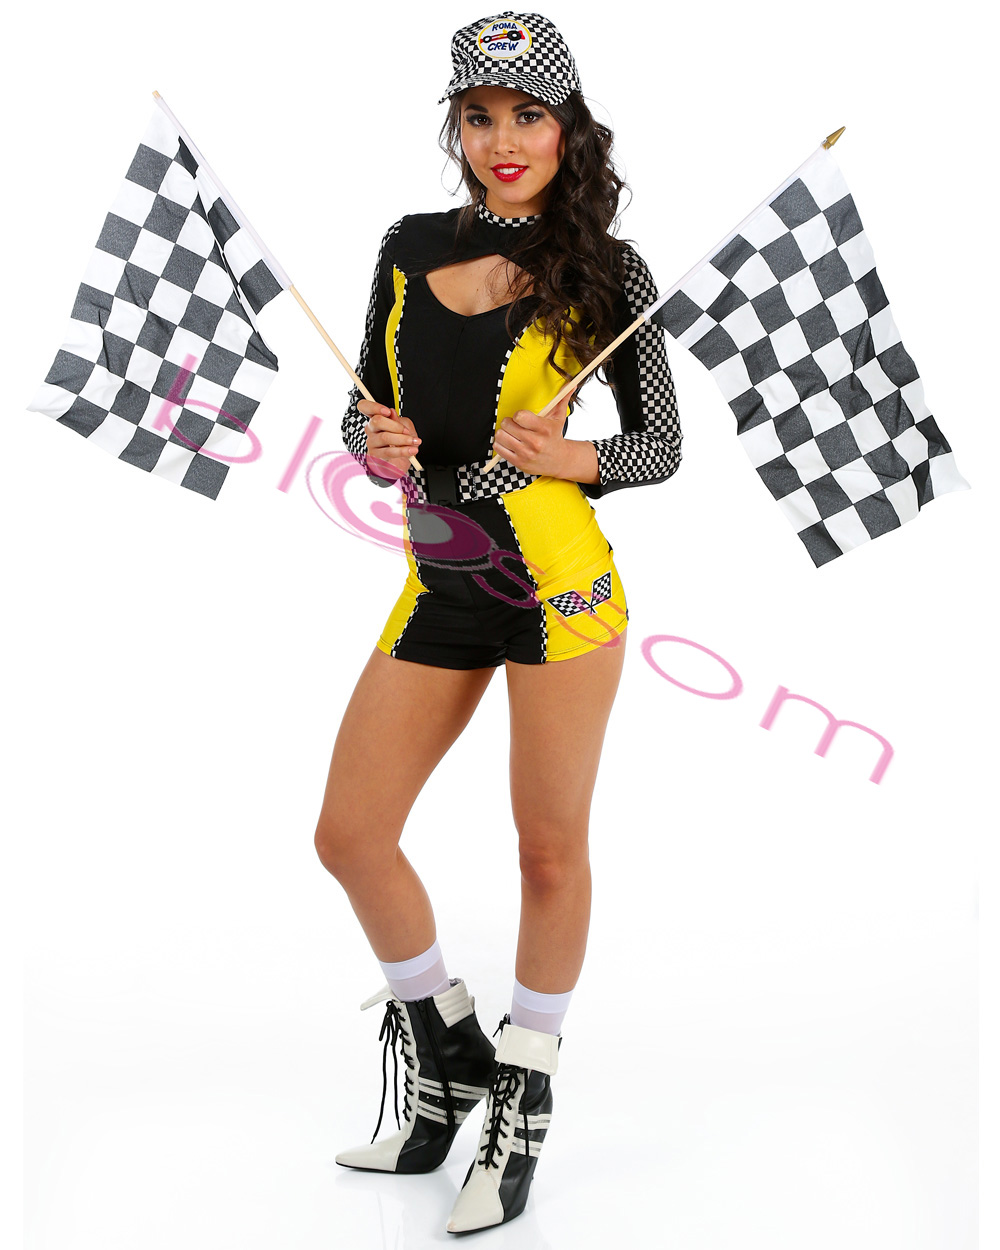 k91 sexy miss indy super car racer racing sport driver. Black Bedroom Furniture Sets. Home Design Ideas